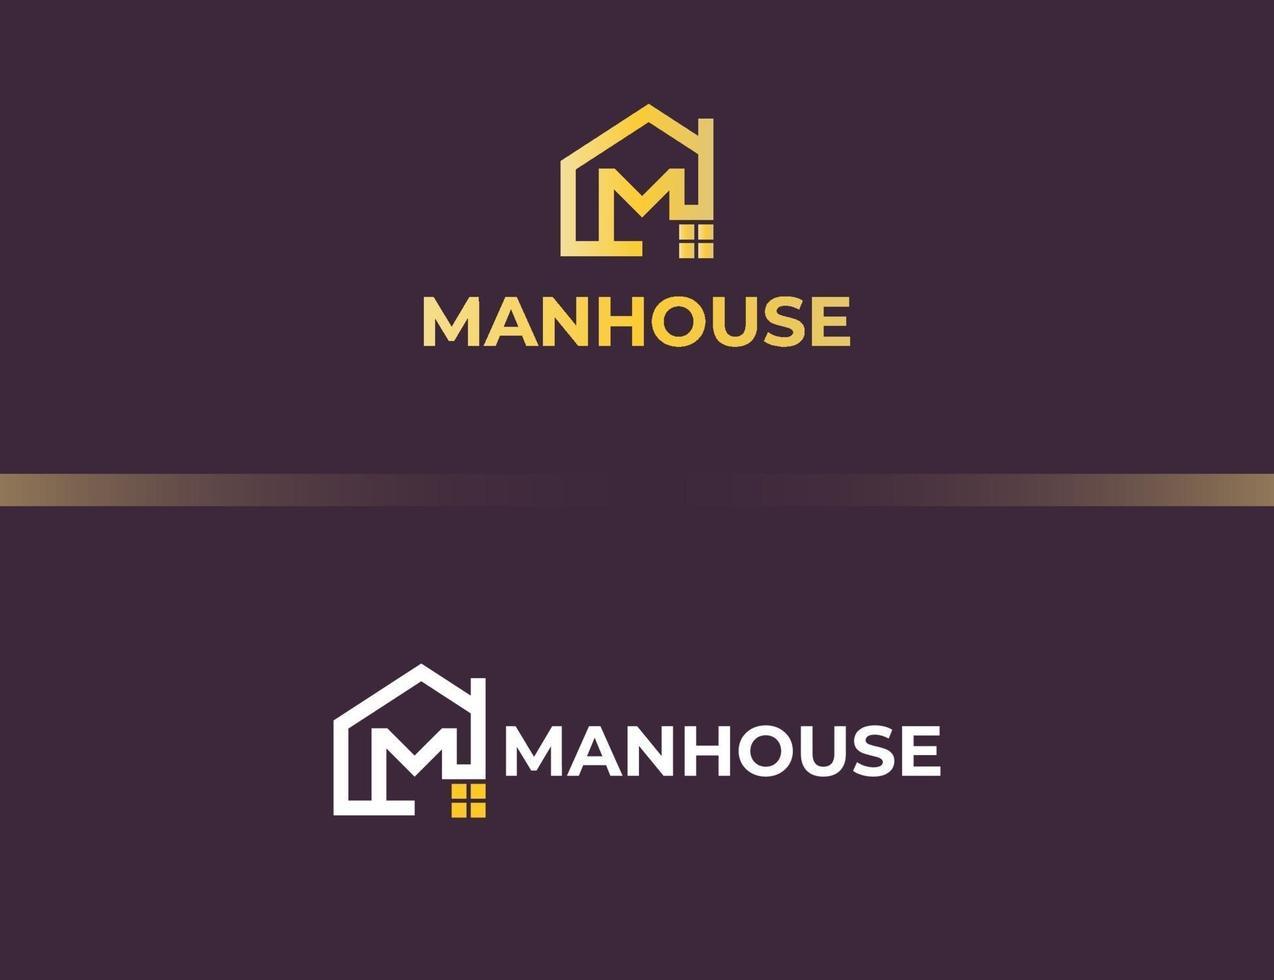 logotipo da letra m dourada com conceito de casa ou edifício vetor